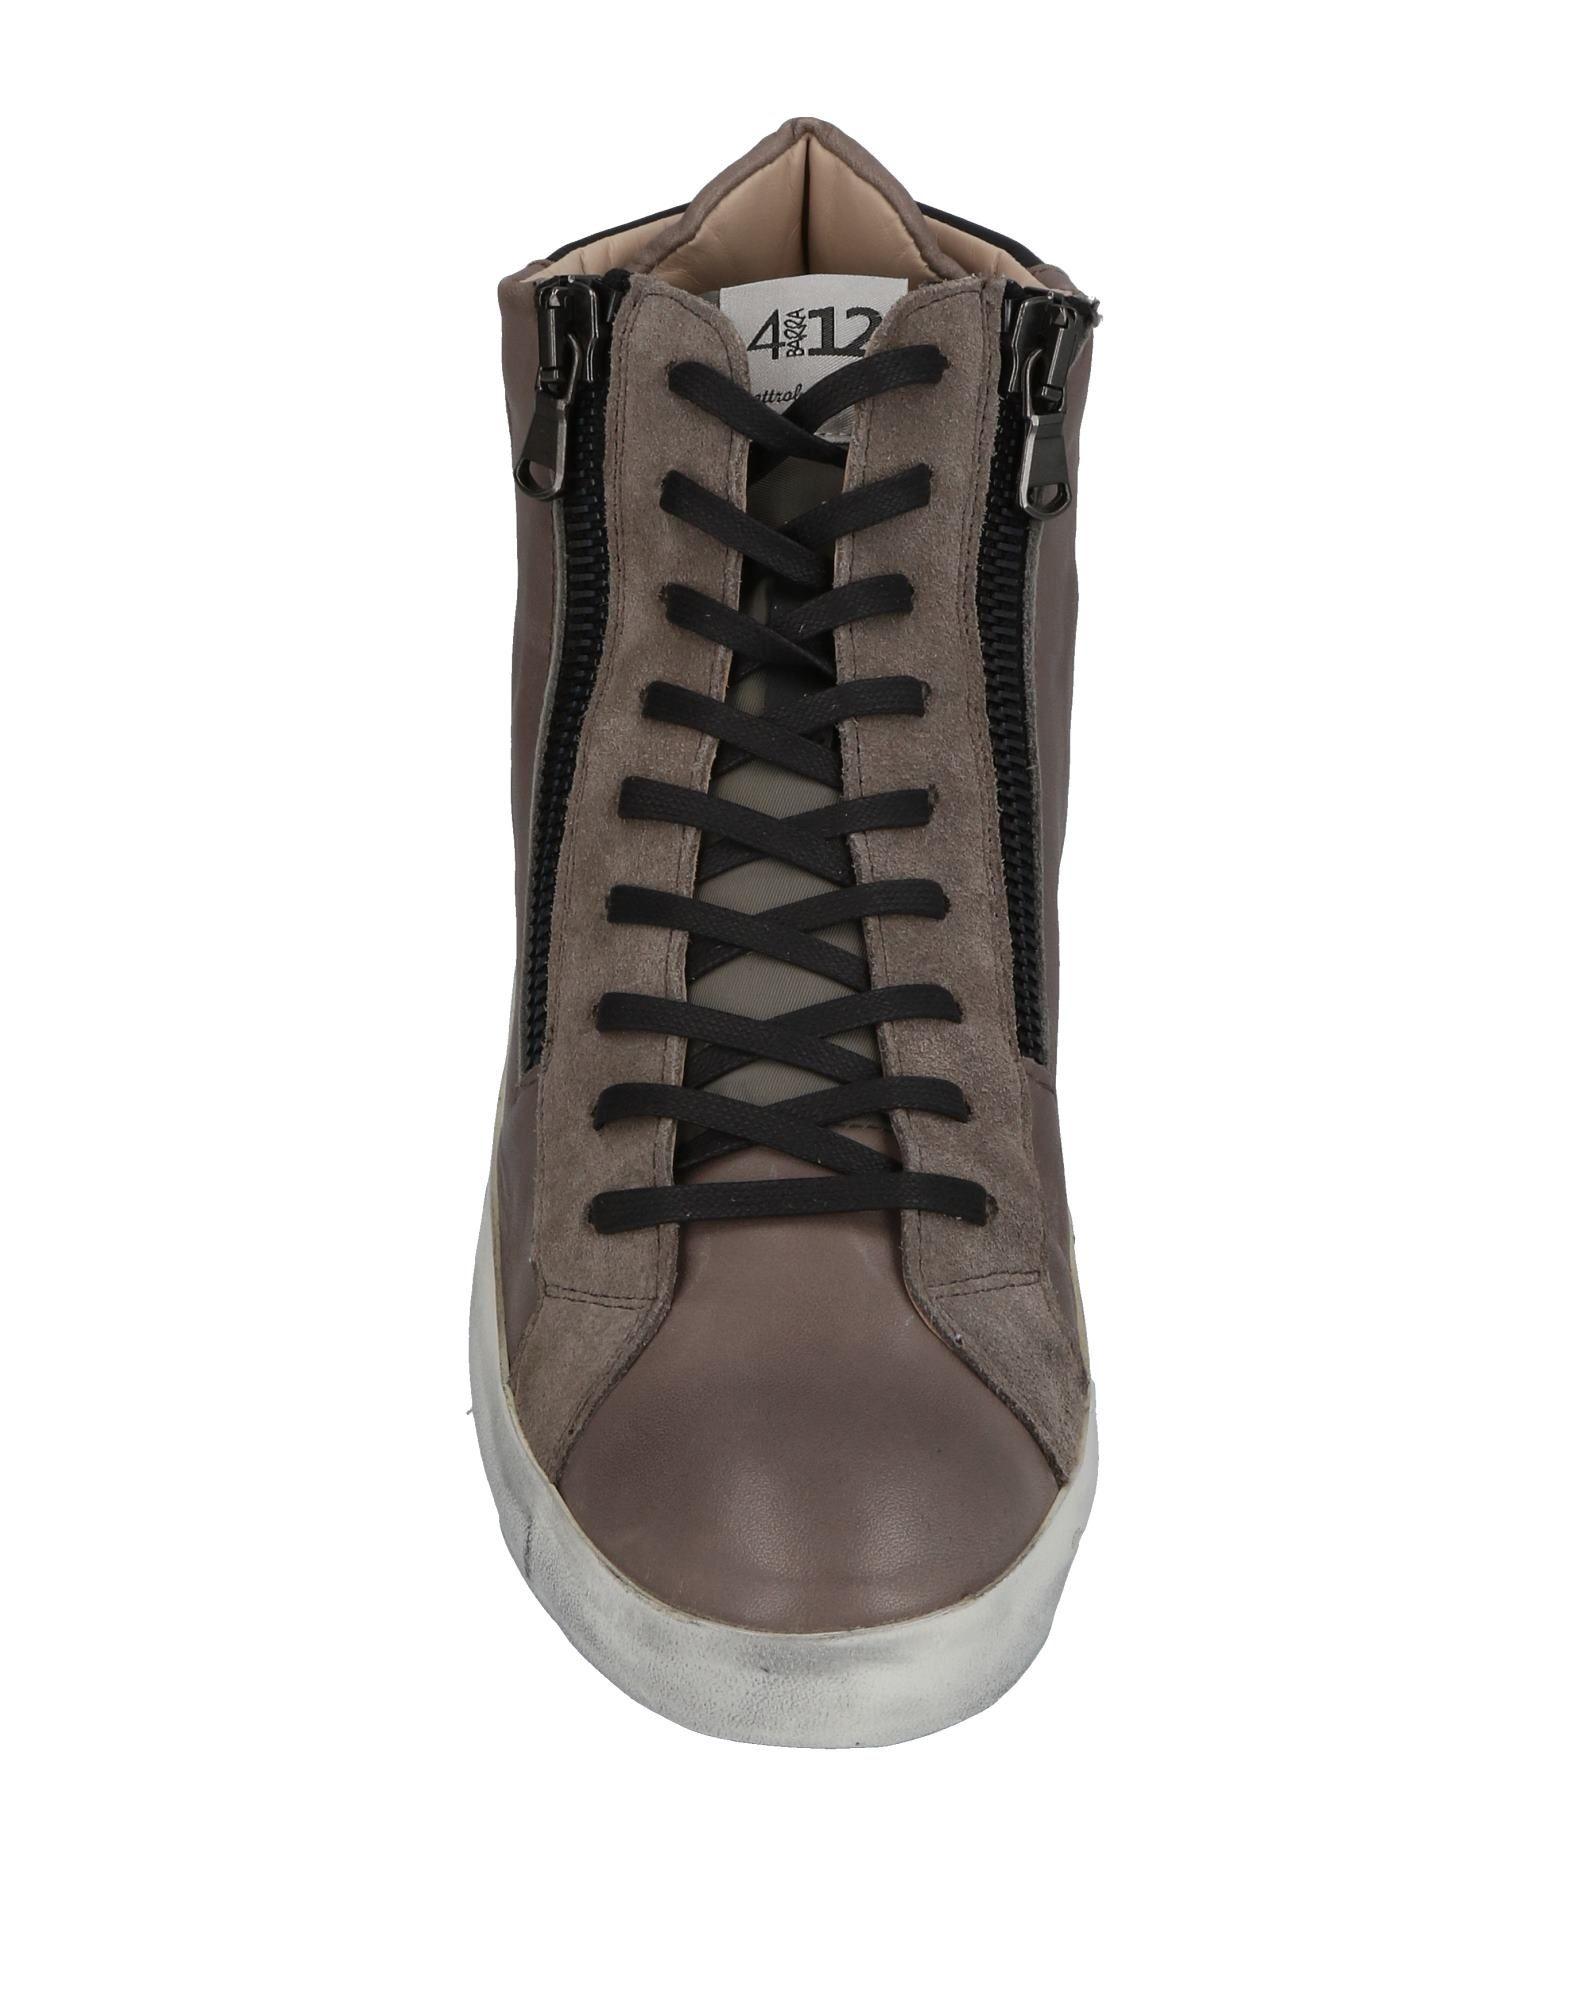 Rabatt echte Schuhe Quattrobarradodici  Sneakers Herren  Quattrobarradodici 11458833SJ 51d27a